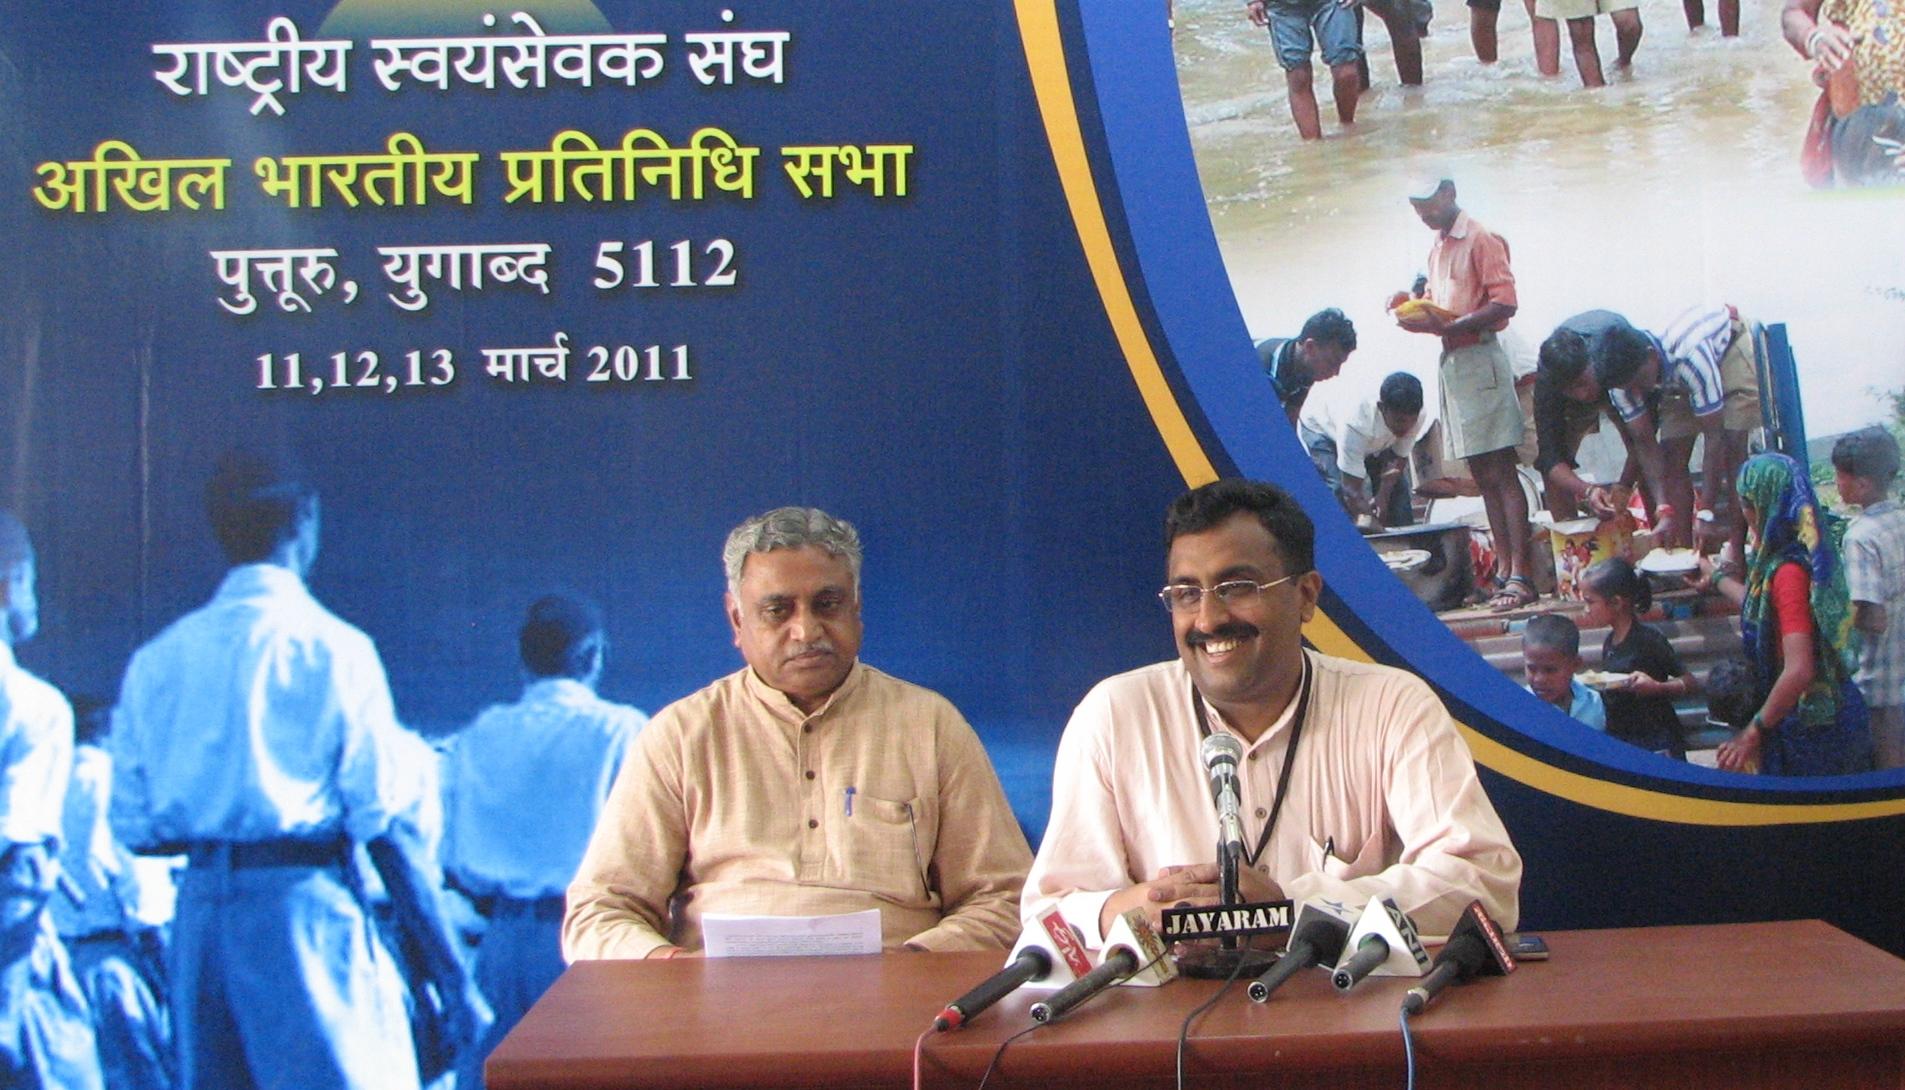 Press-briefing by Ram Madhav: ಪತ್ರಕರ್ತ ಸಂವಾದದಲ್ಲಿ ರಾಮ್ ಮಾಧವ್